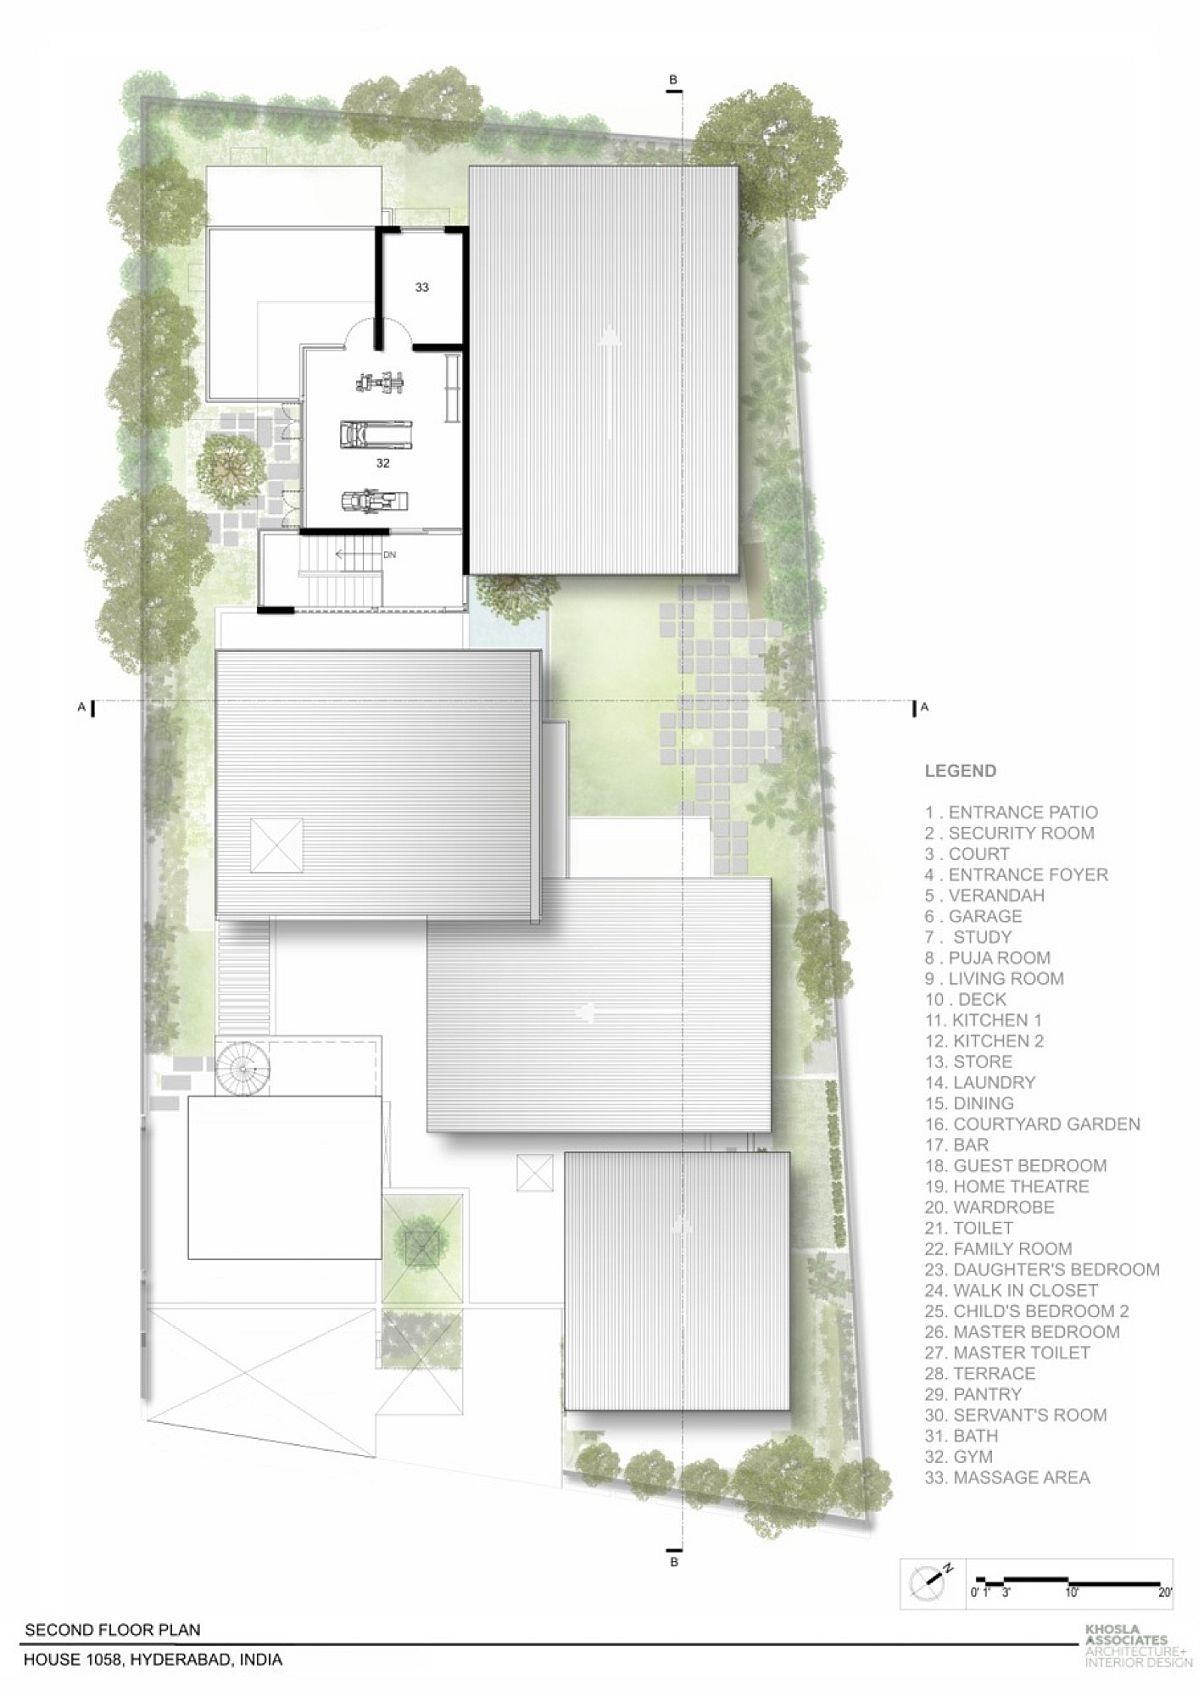 Terrace floor plan of modern house in india